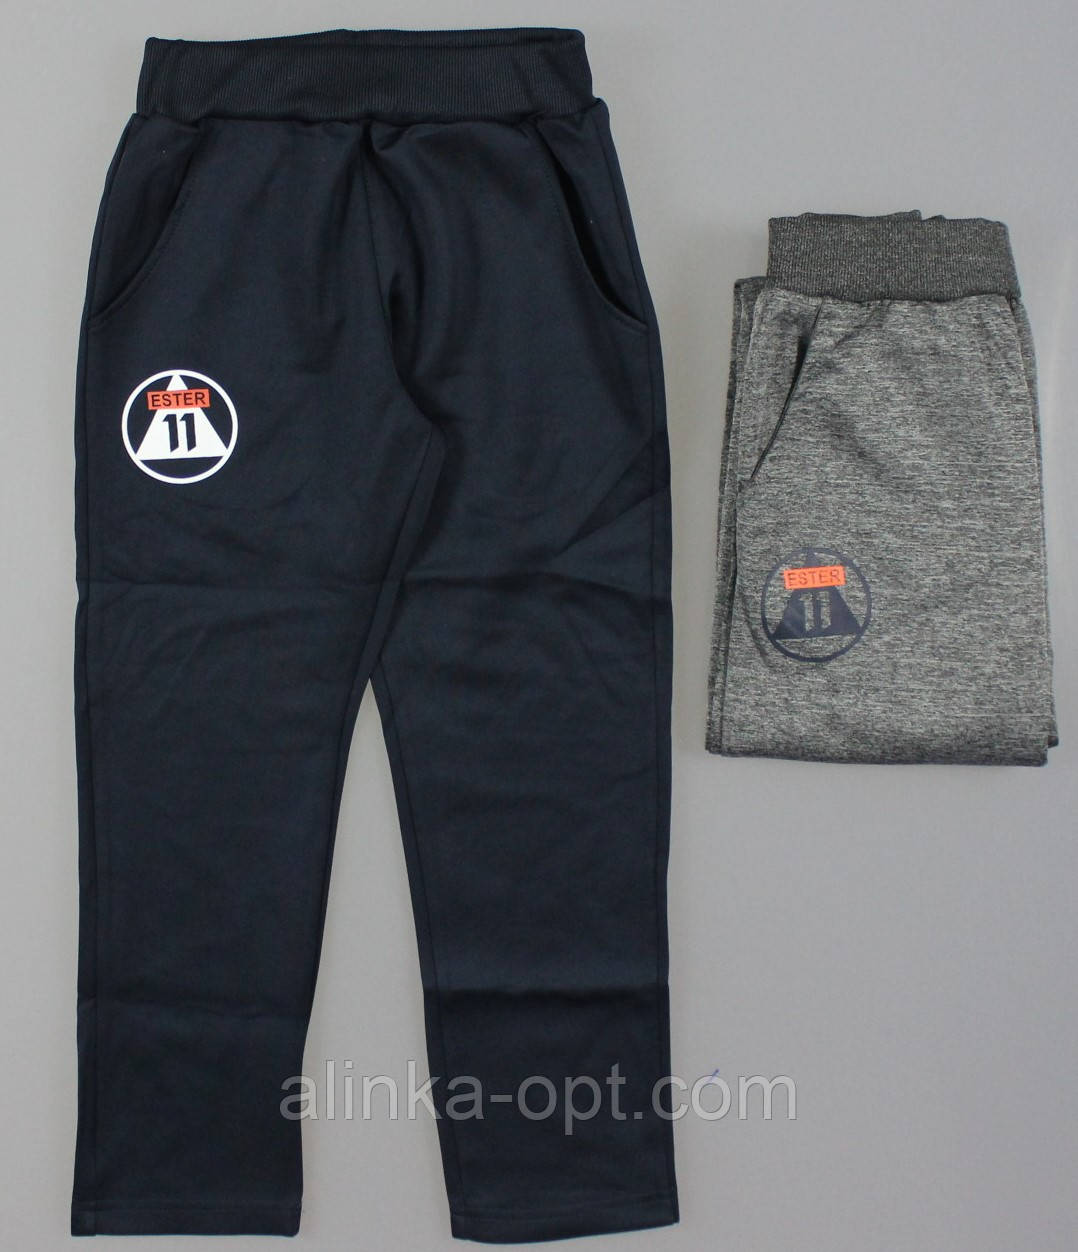 Спортивные брюки на мальчика оптом, Glo-story,110-164 рр